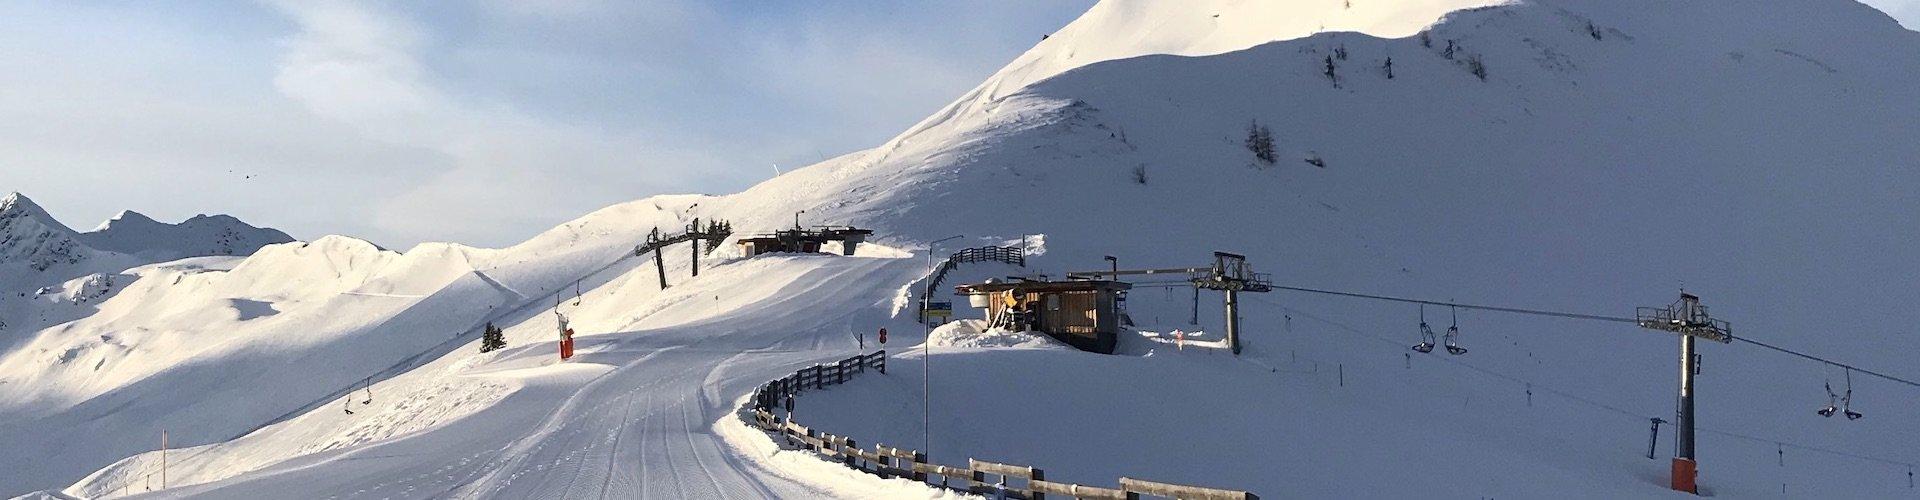 Skigebiet Alpbachtal Wildschönau